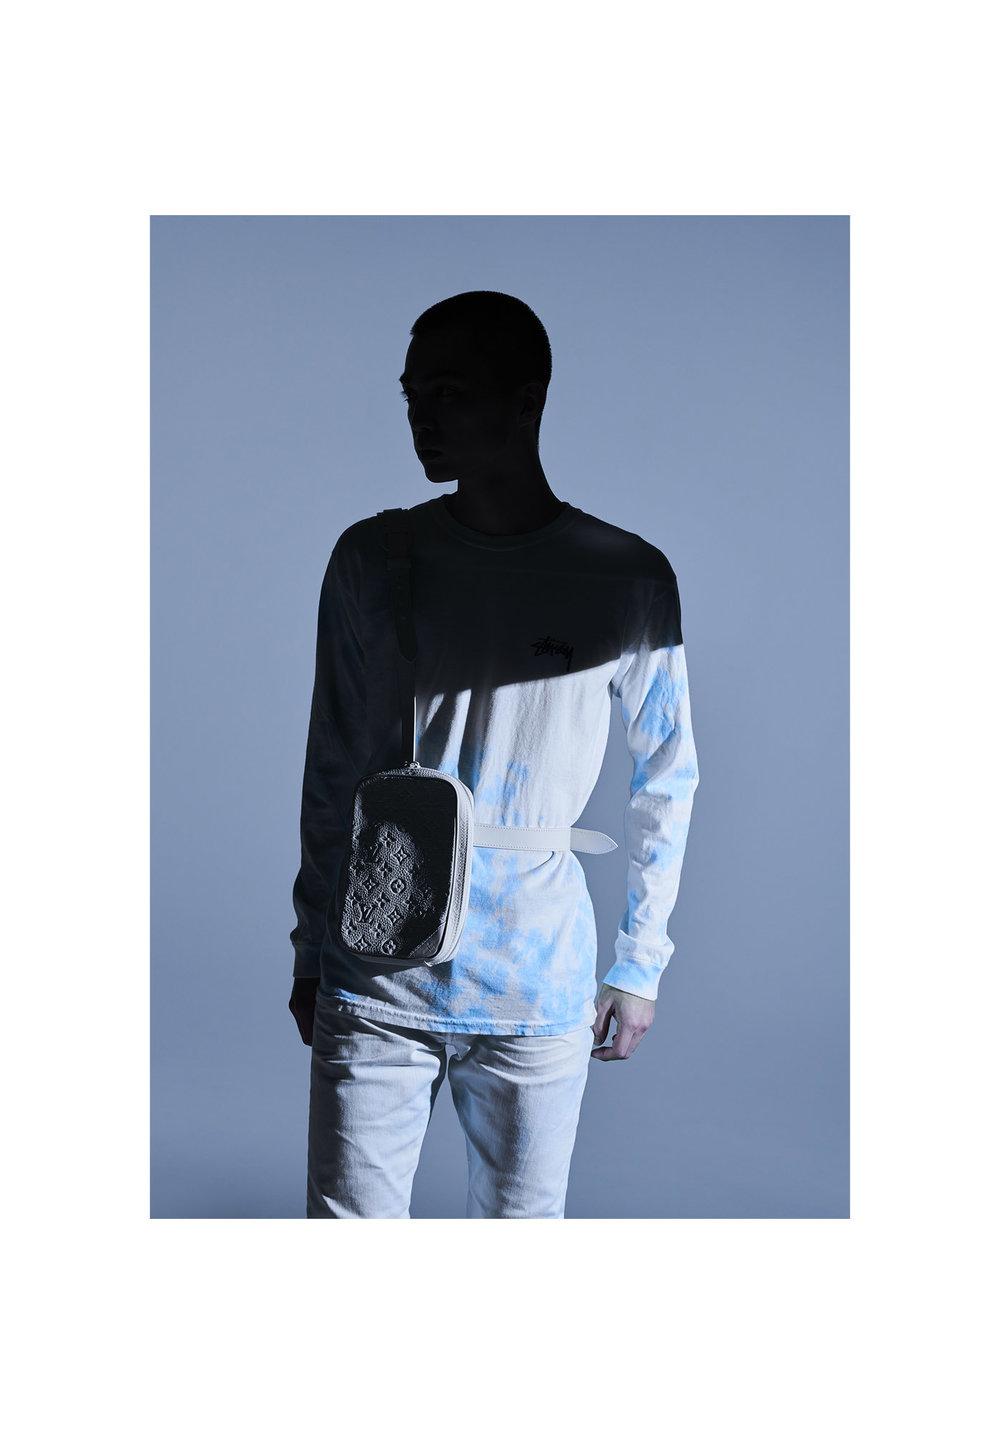 1 Jacket - 6876 2. Top - Stussy (Mr Porter) Bag - Louis Vuitton Jeans - John Elliot (Mr Porter)